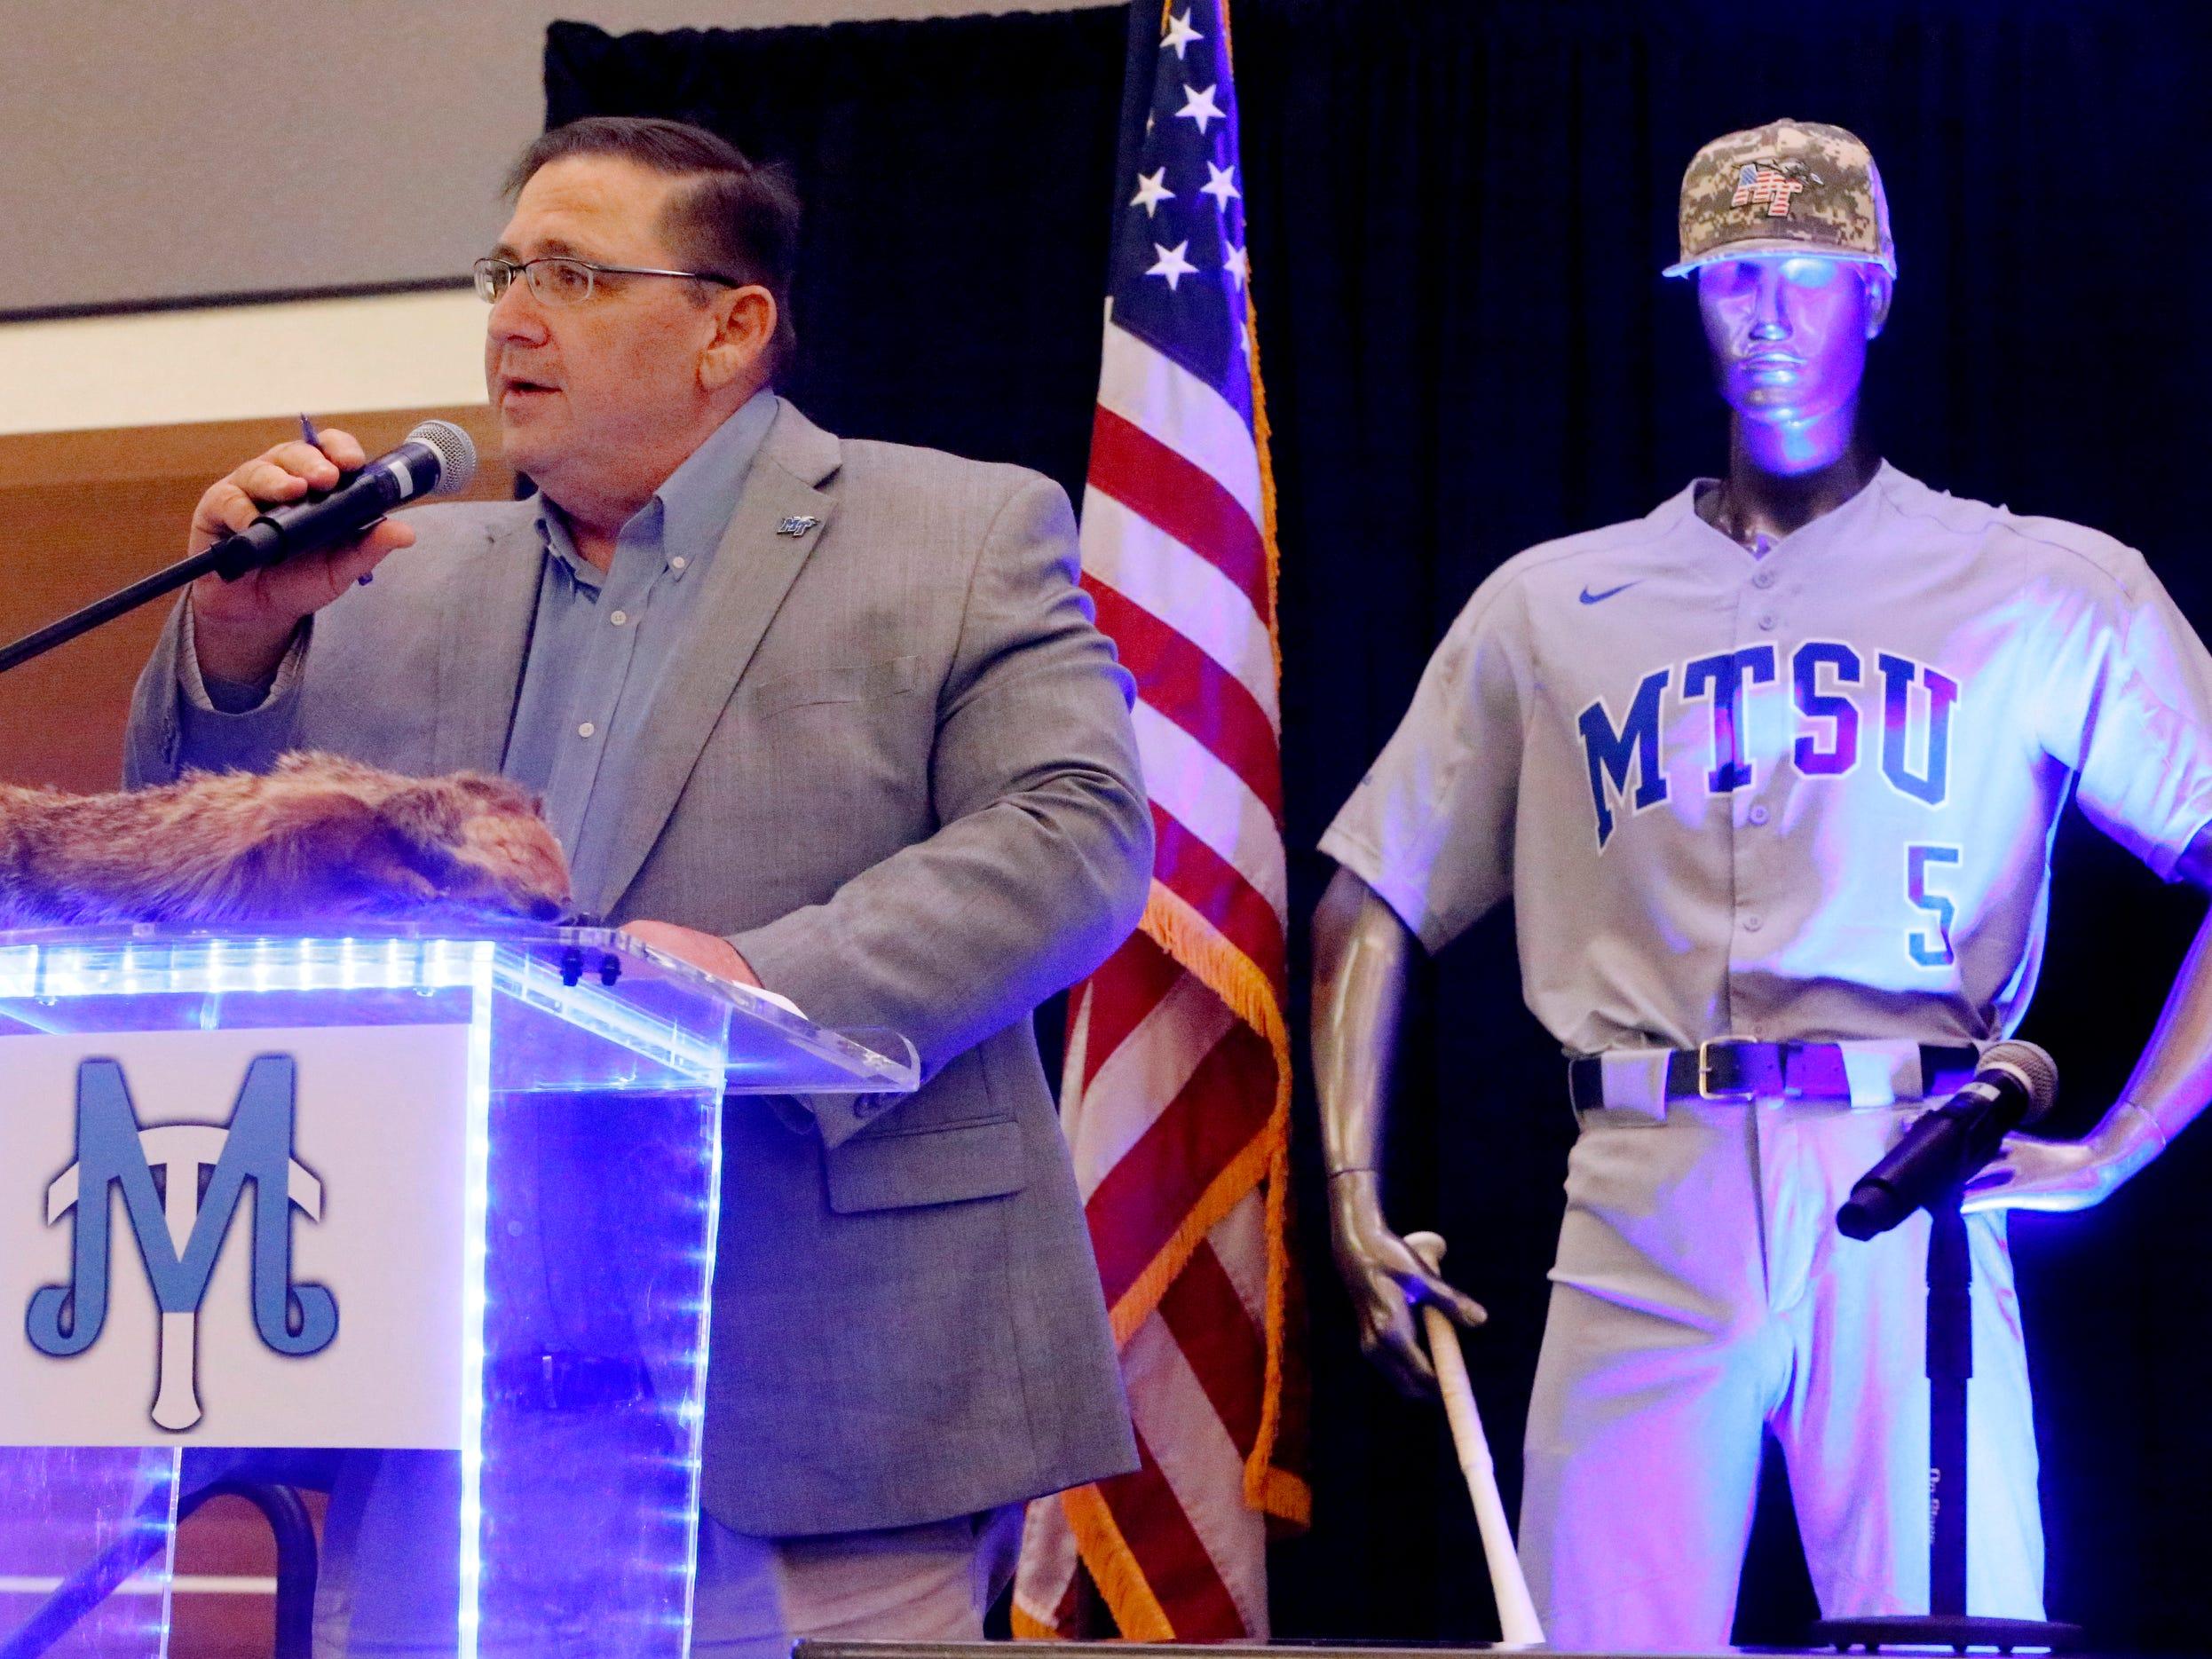 MTSU's new baseball coach Jim Toman, left, talks to the crowd on Friday, Feb. 1, 2019, at the annual MTSU baseball kickoff Groundhog Day Luncheon.